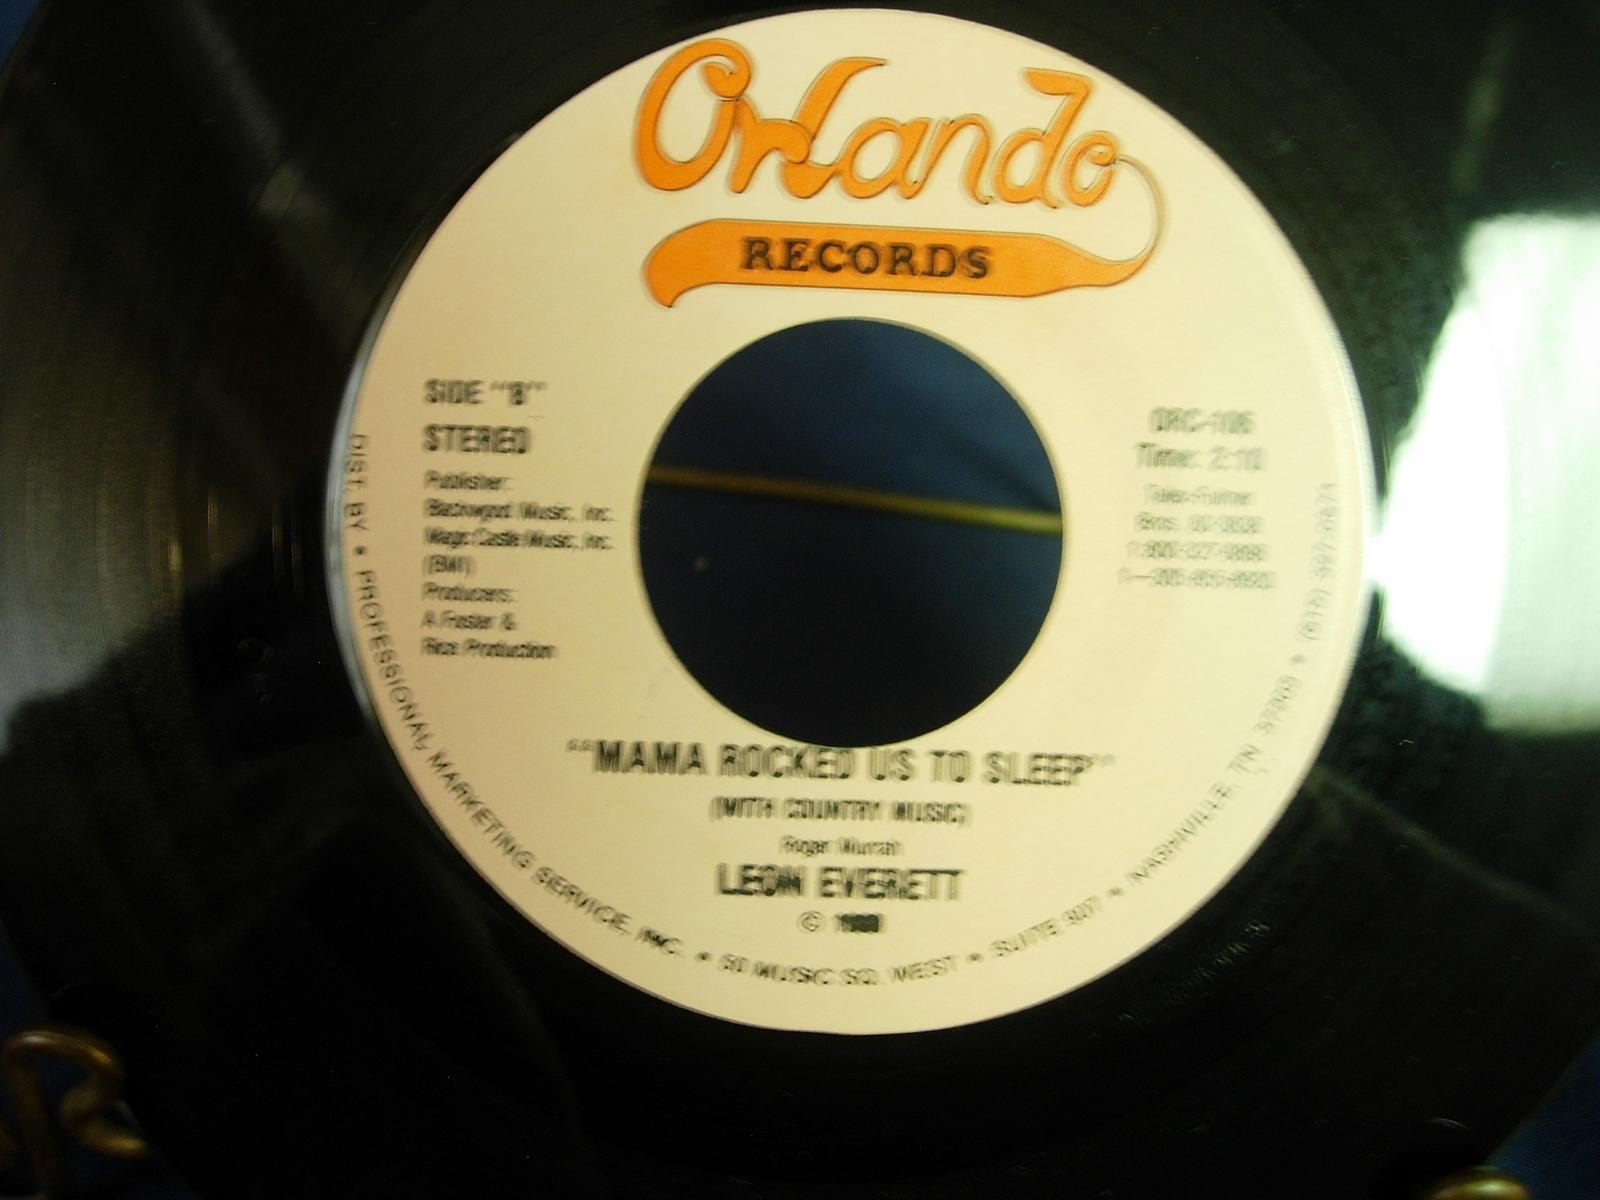 Leon Everett - I Don't Want to Lose / Mama Rocked Us To Sleep - Orlando ORC-106